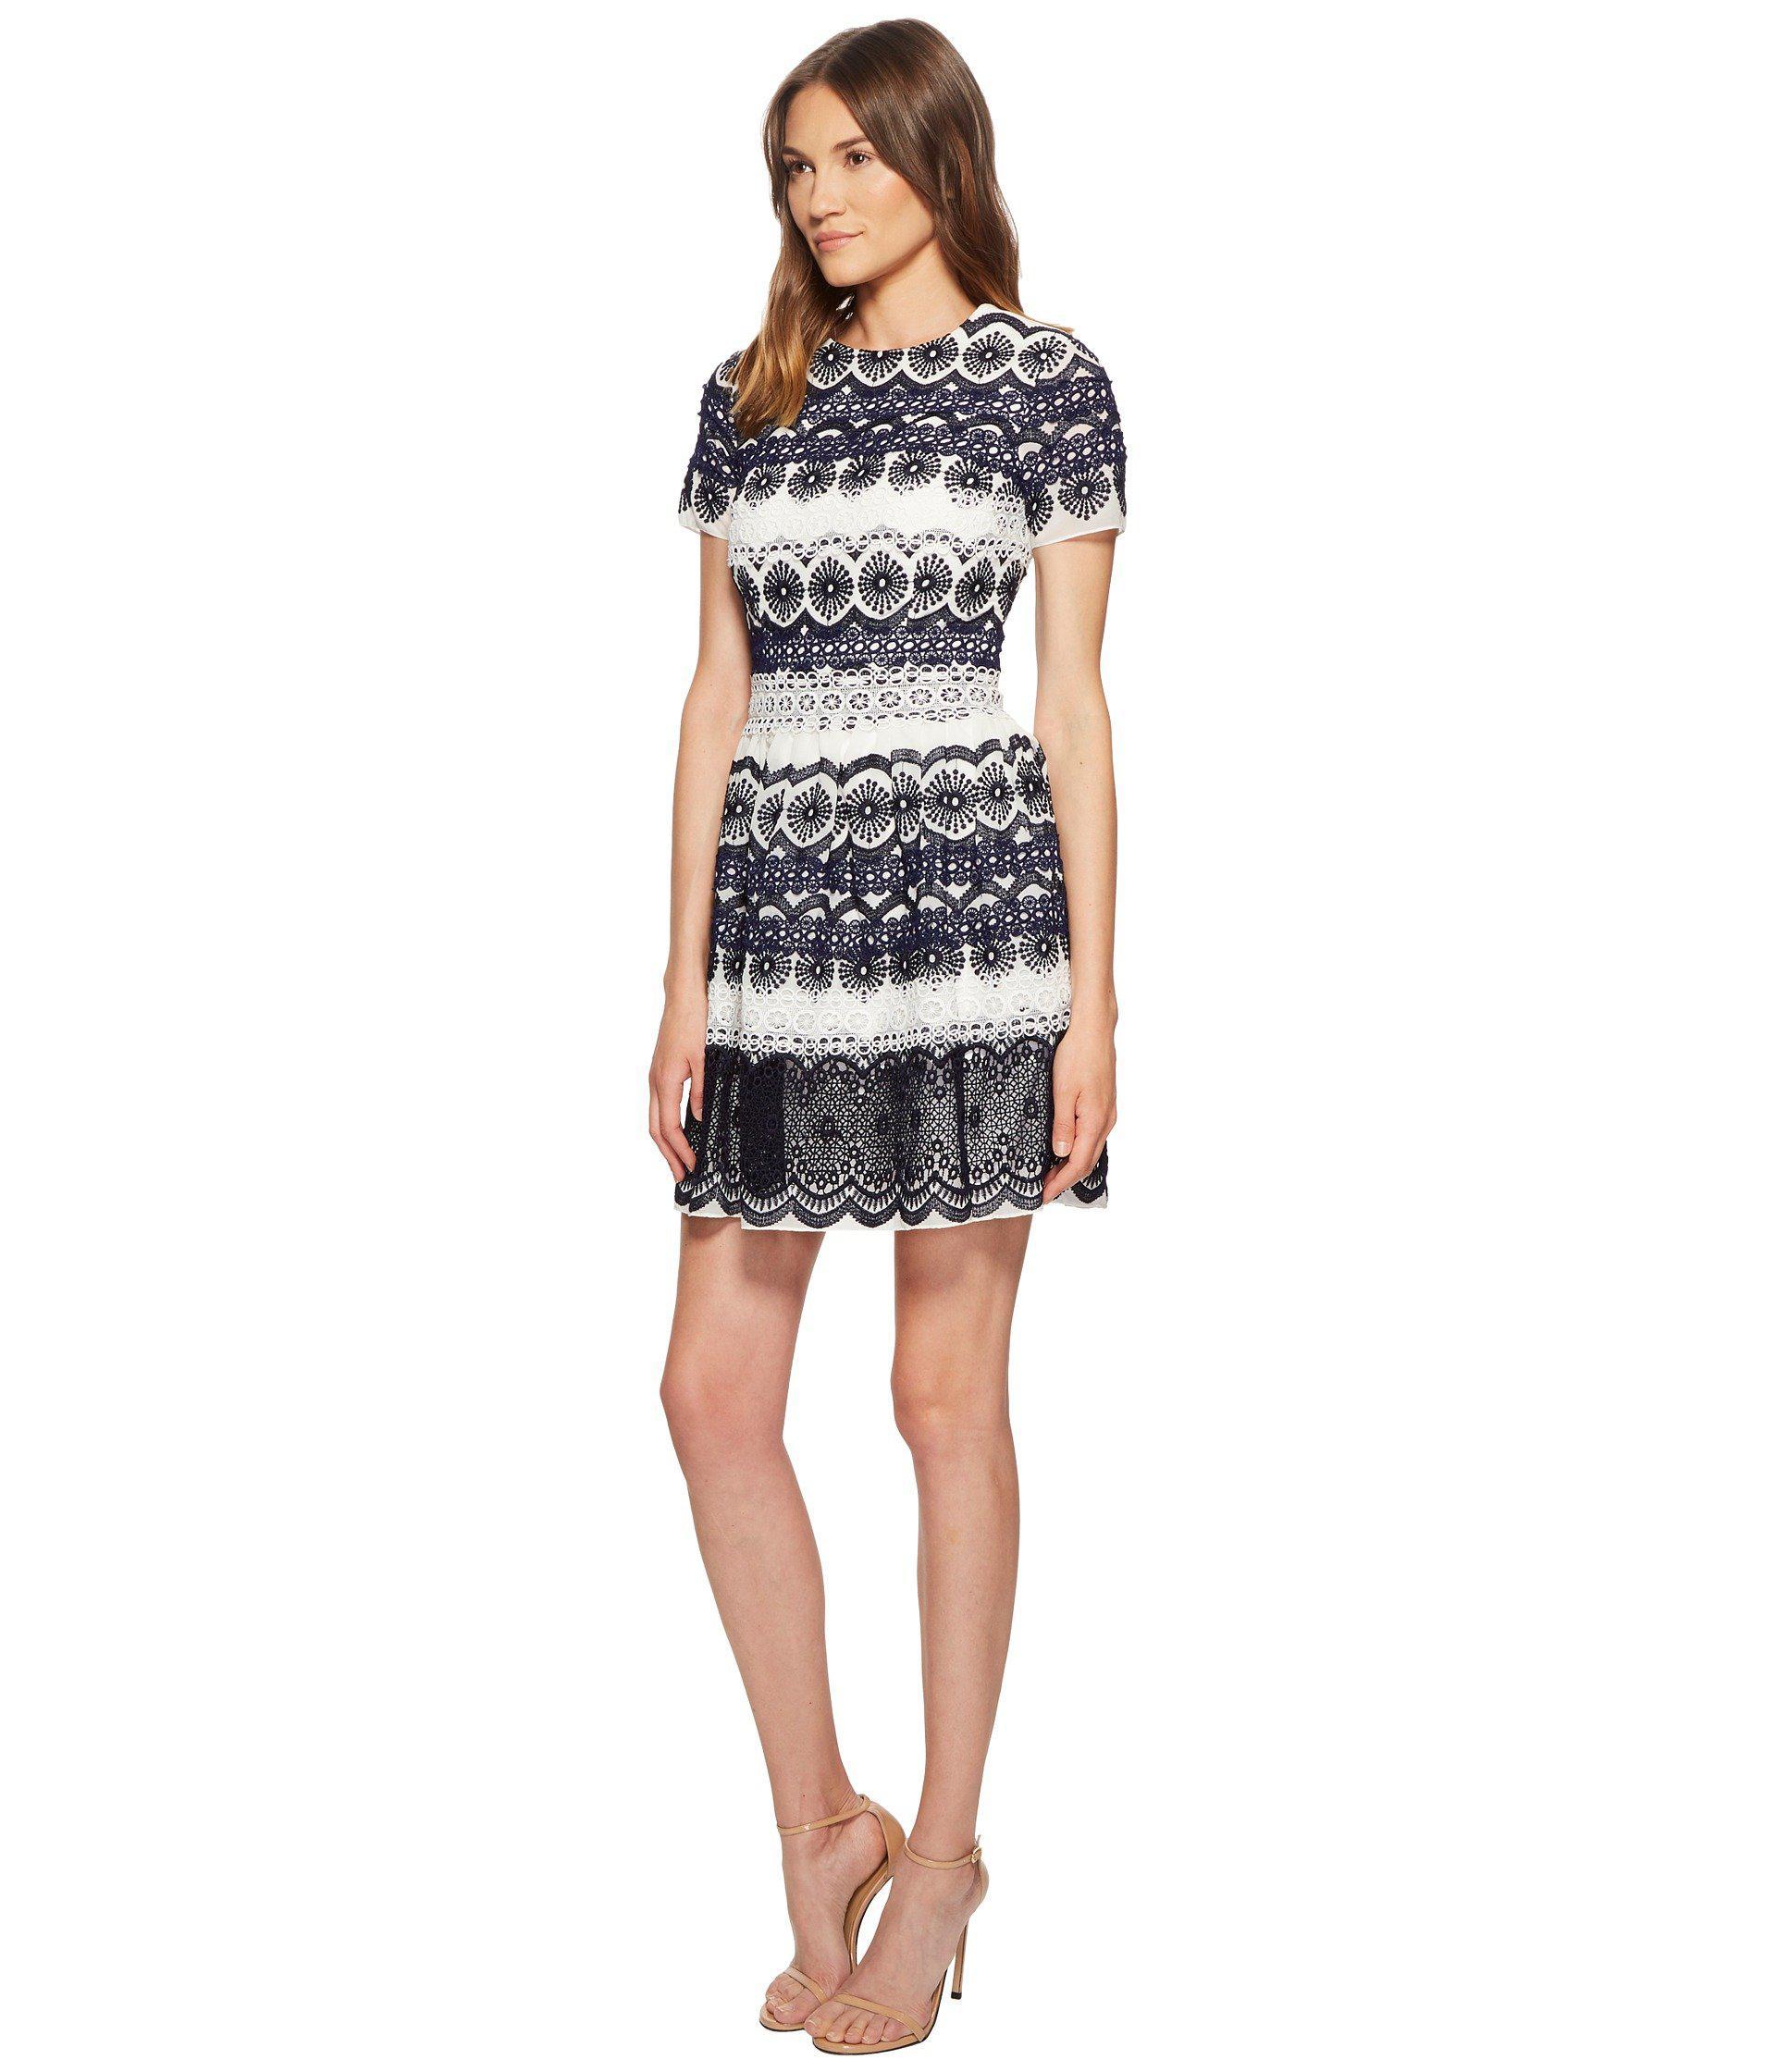 298d27e34f7 Lyst - ML Monique Lhuillier Short Sleeve Lace Print Dress (navy Combo)  Women s Dress in Blue - Save 82%